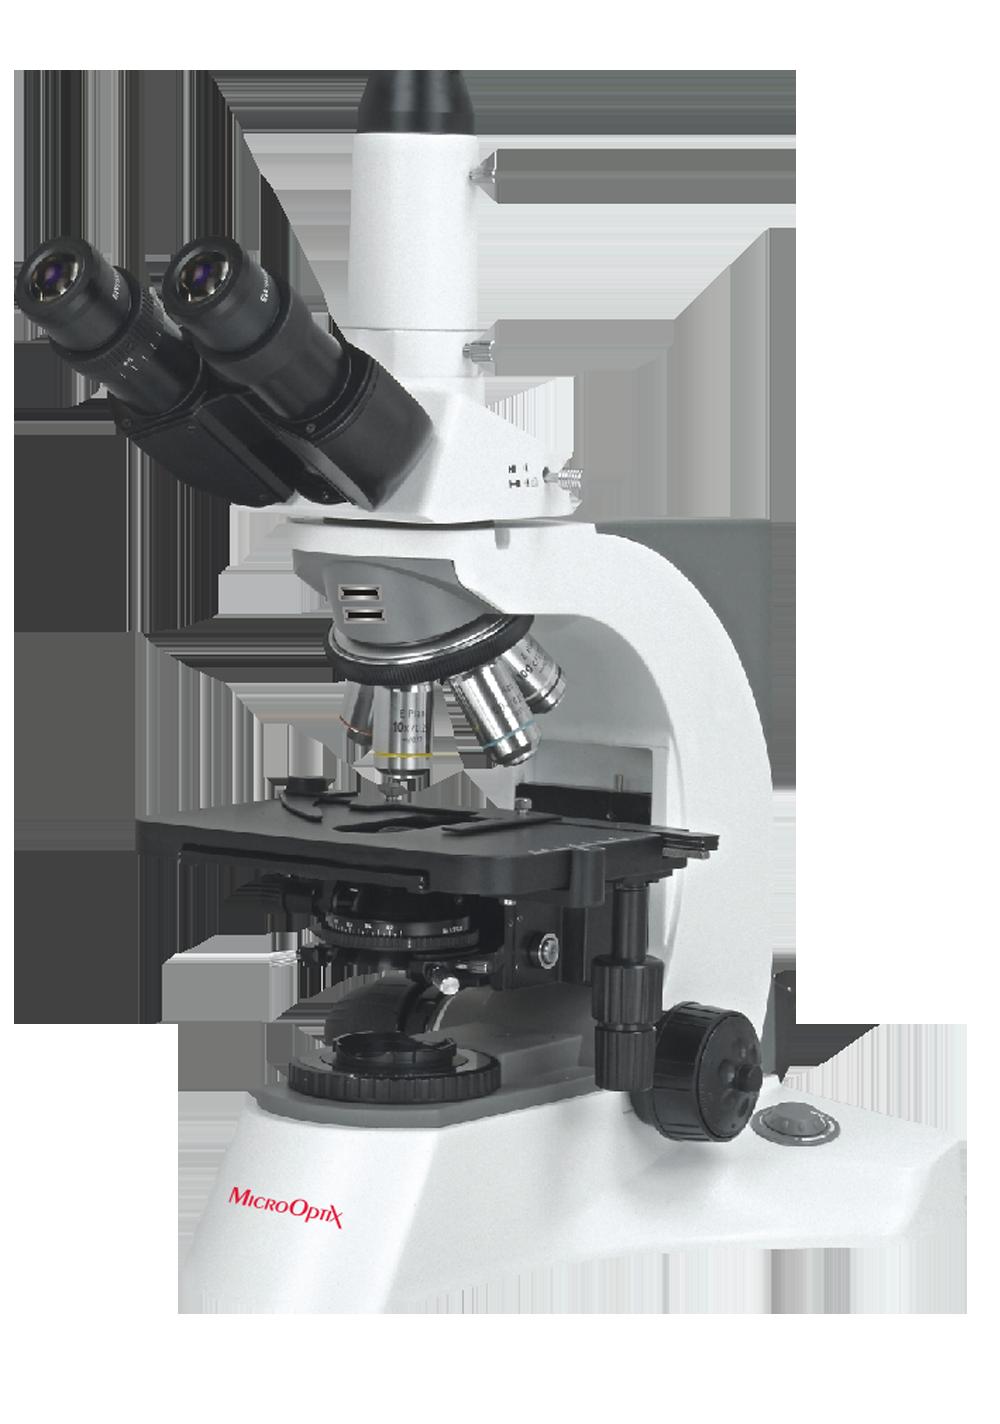 MX 800 / MX 800 (L) Research biological microscopes